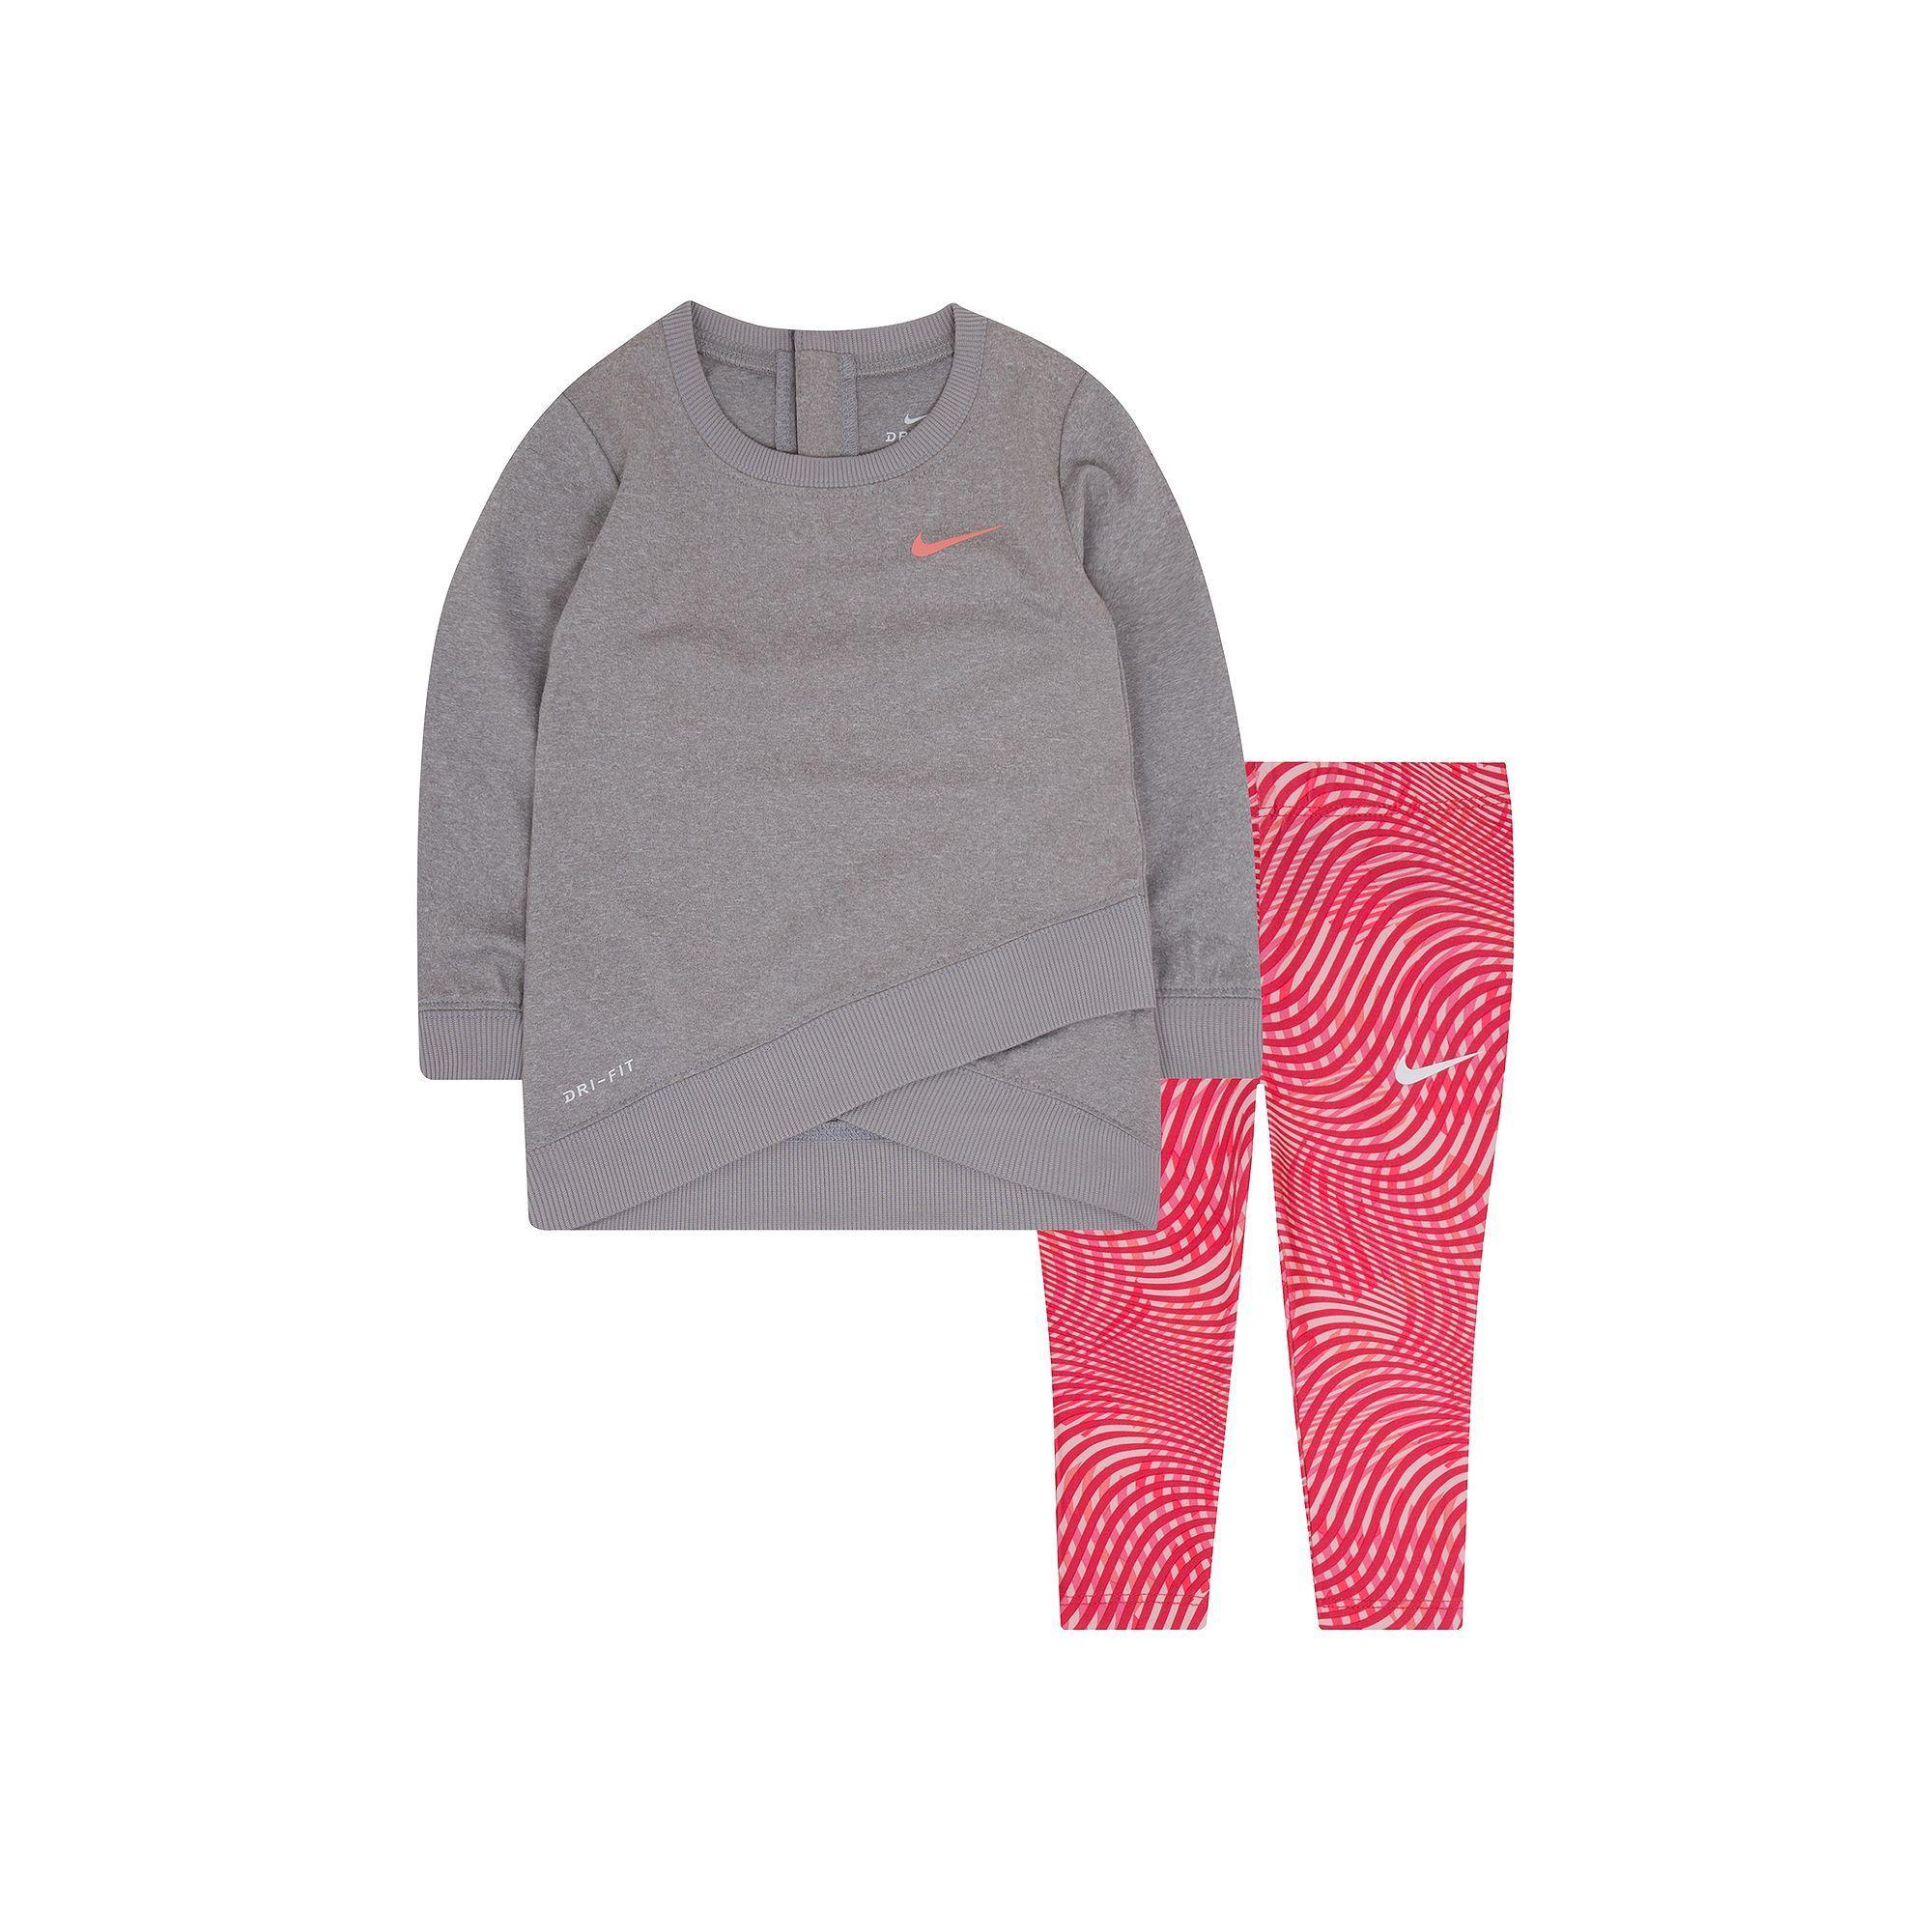 8ae3d1e472e4 Nike Baby Girl Dri-FIT Graphic Sweatshirt   Print Leggings Set ...